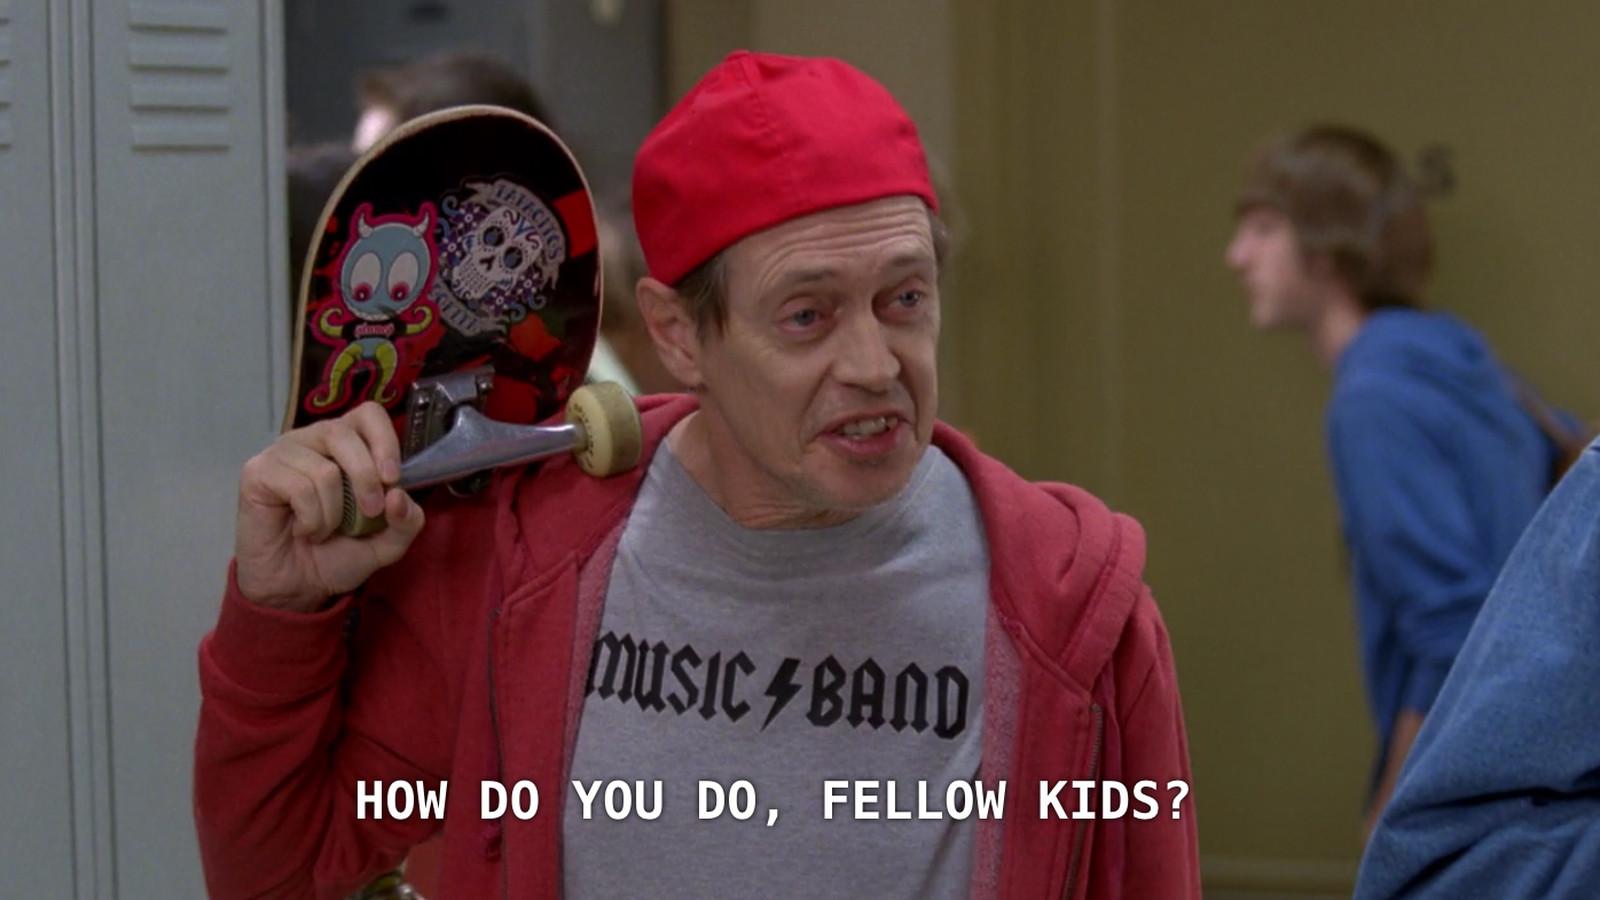 Steve Buscemi - How do you do, fellow kids?